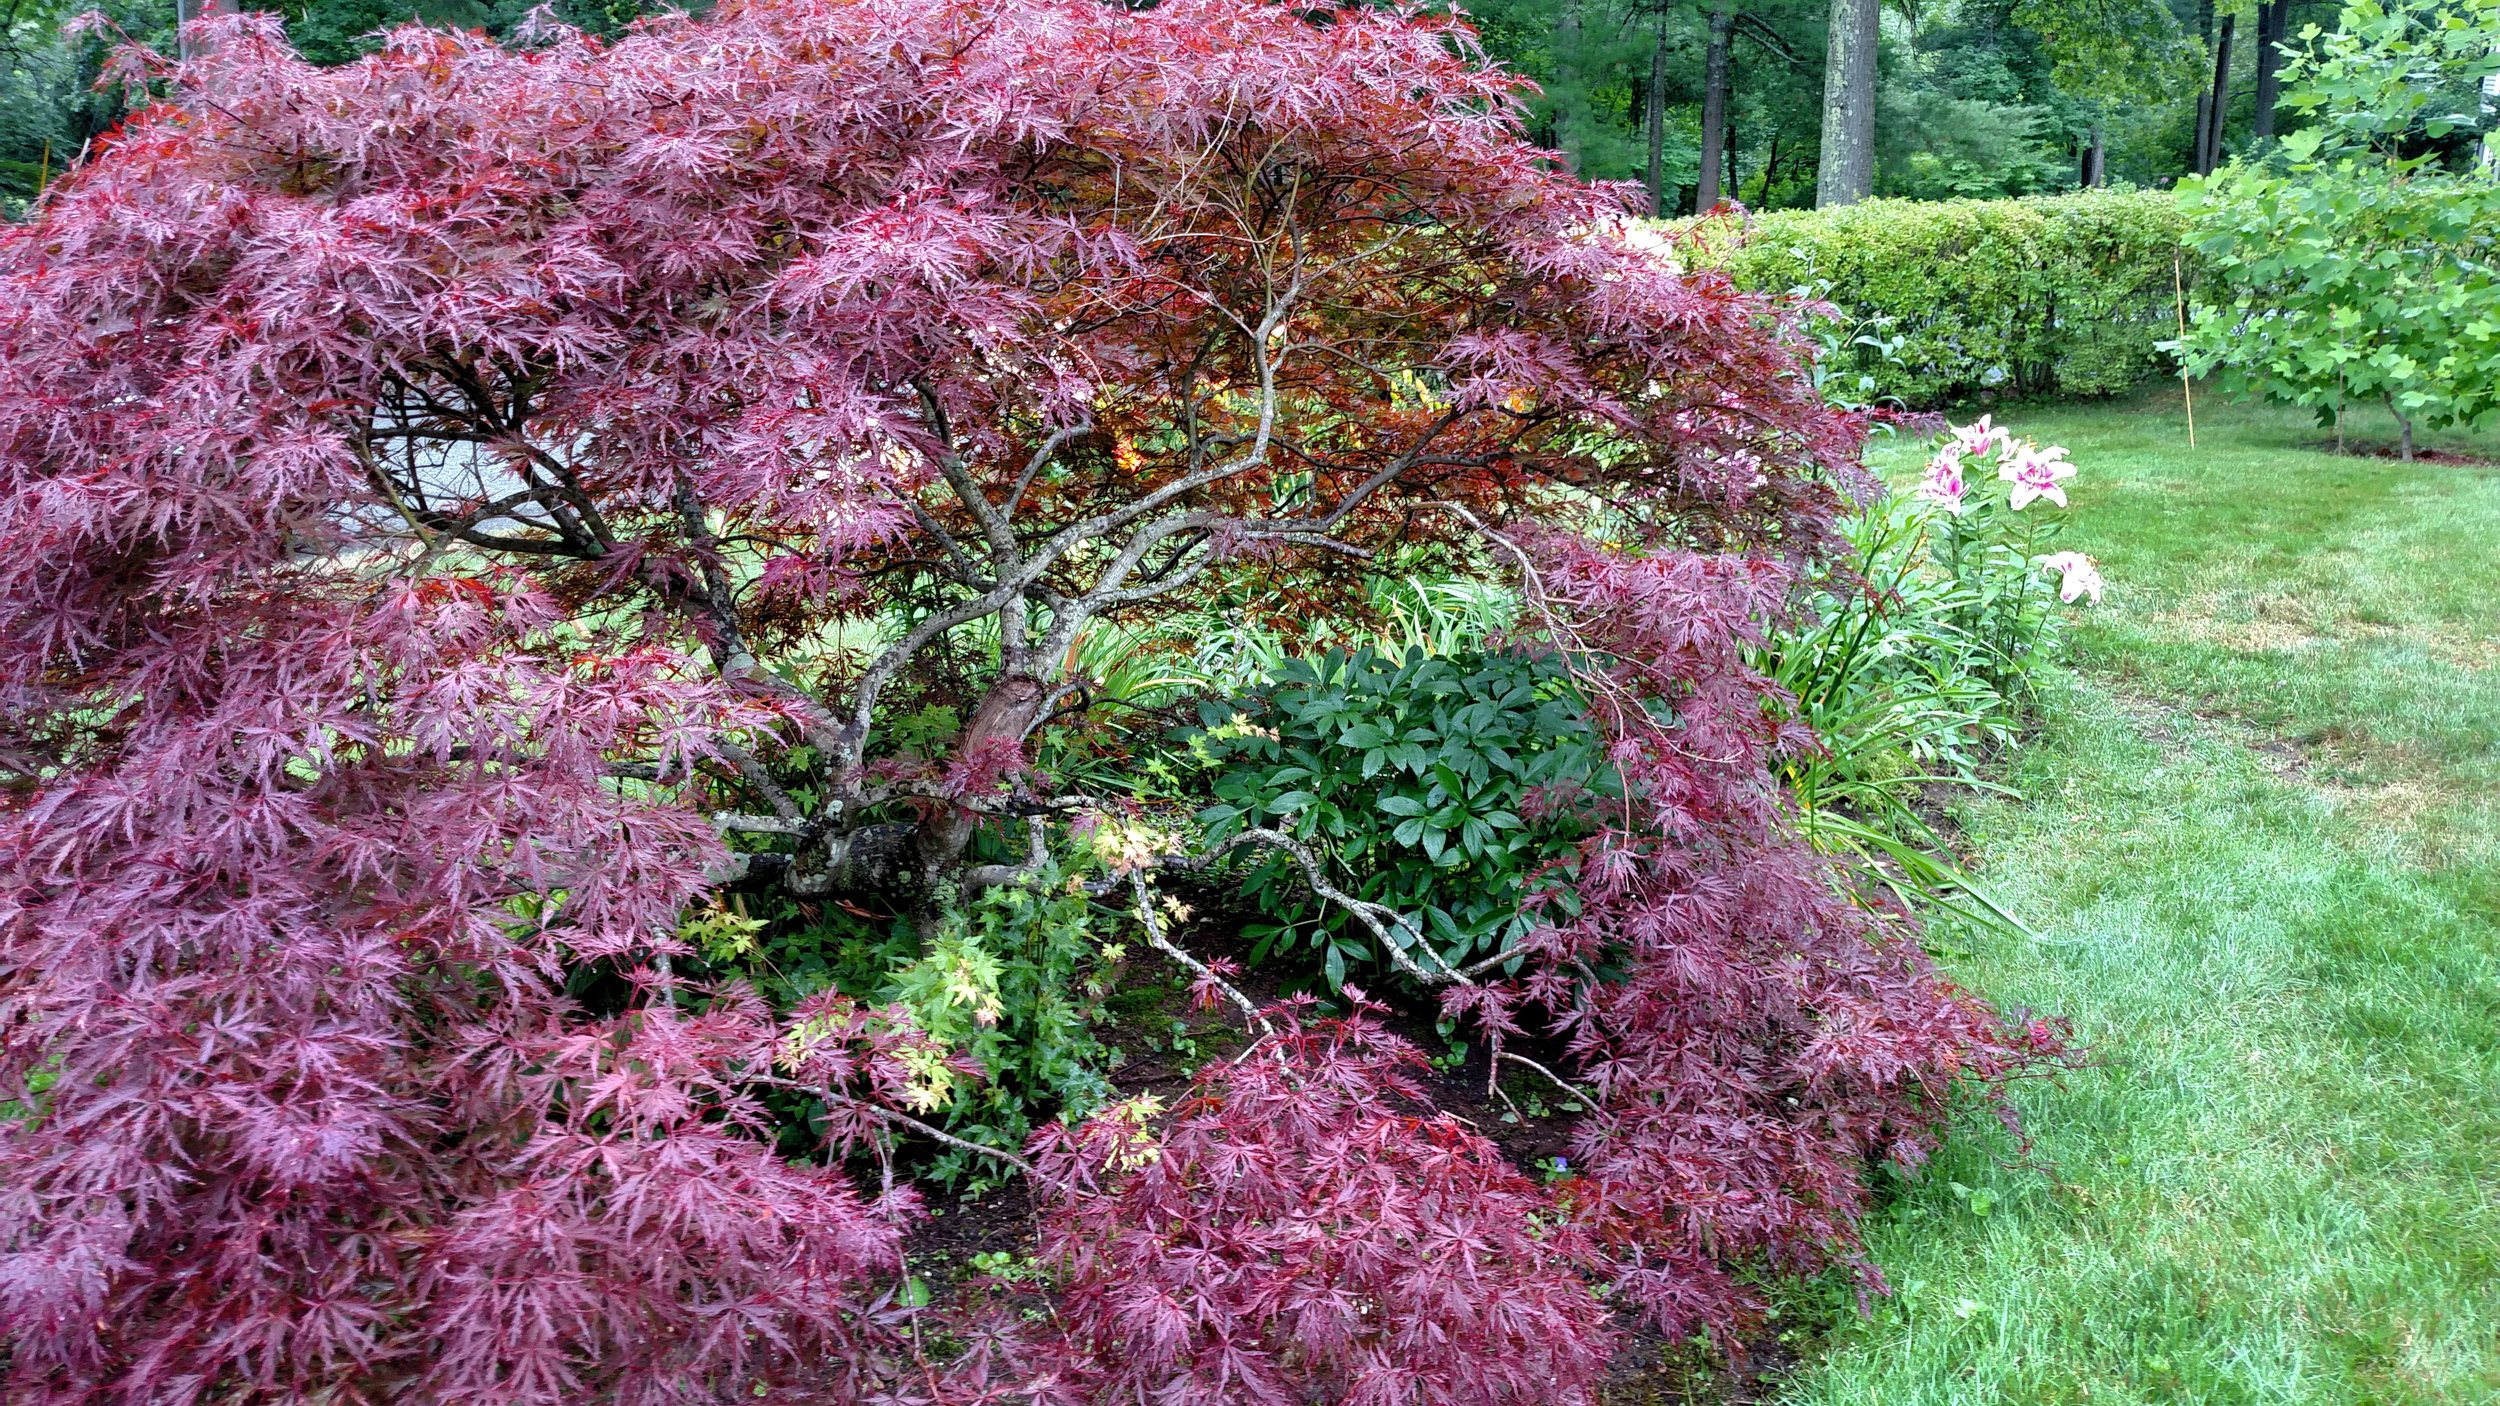 7-20-18 Shapiro Garden 3.jpg